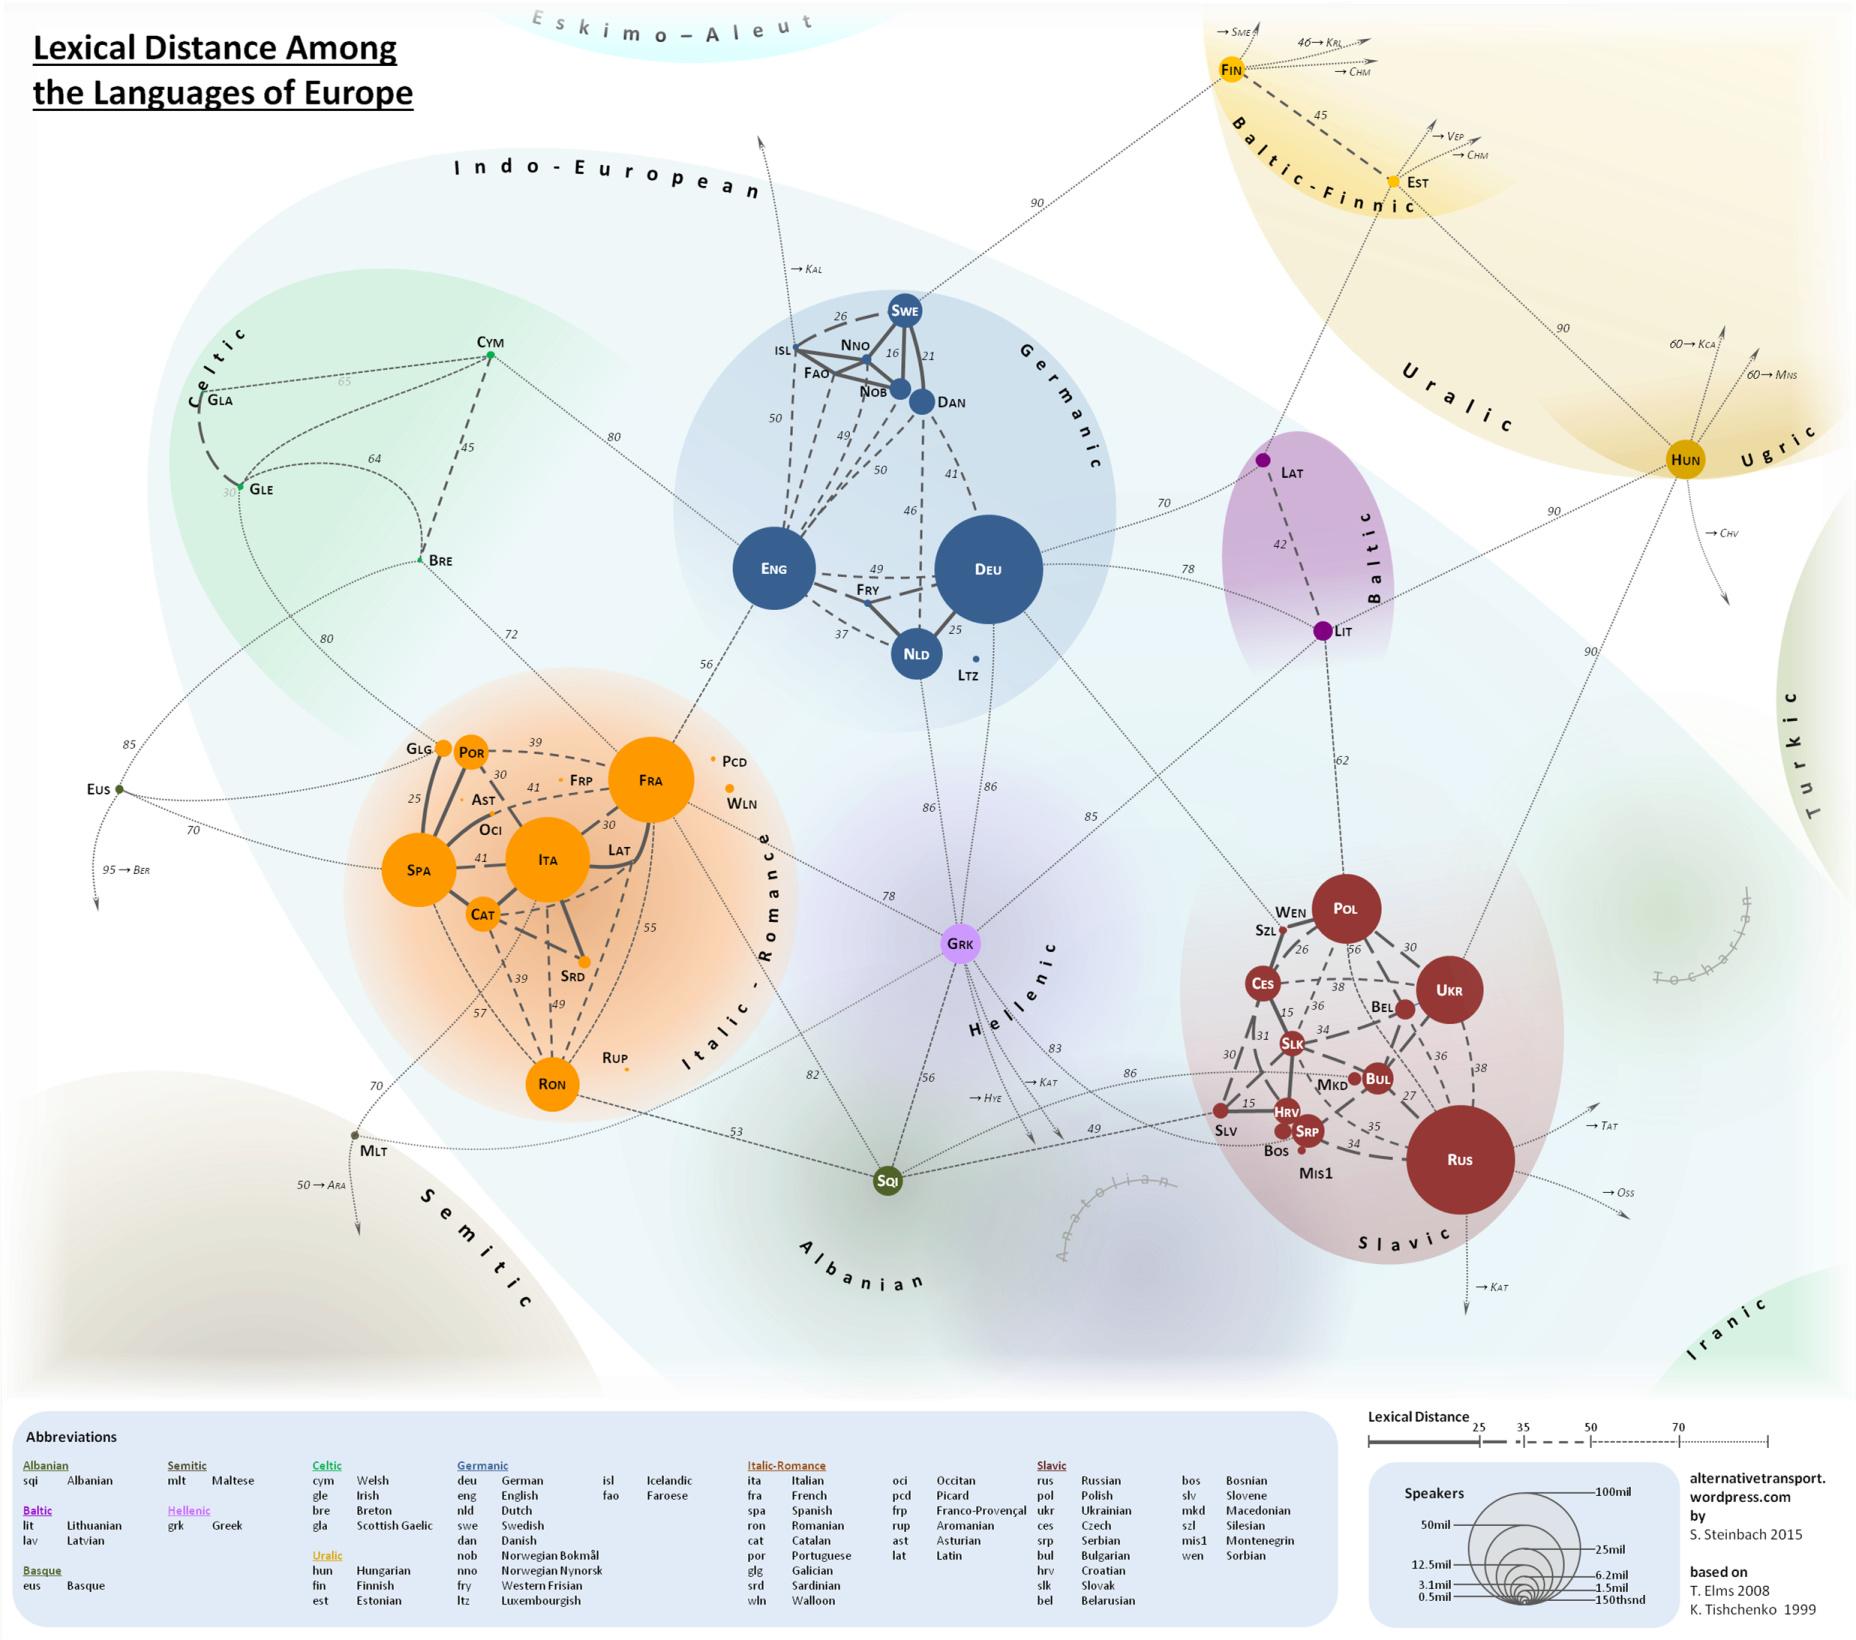 Distances Between European Languages Lexica10